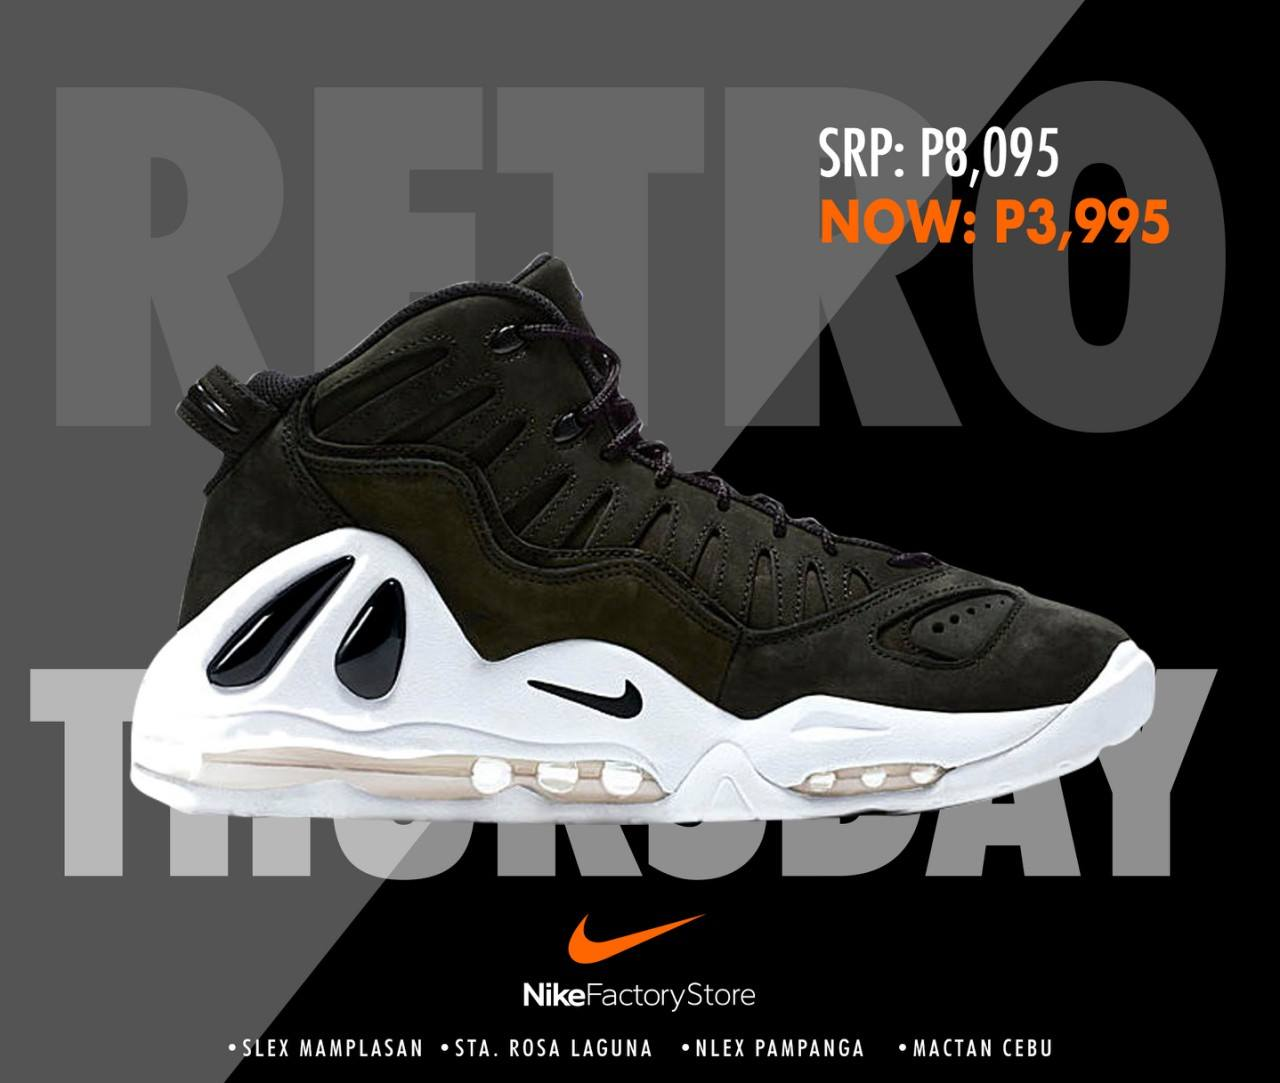 Nike Factory Store: 50% OFF JORDANS!!! | Manila On Sale